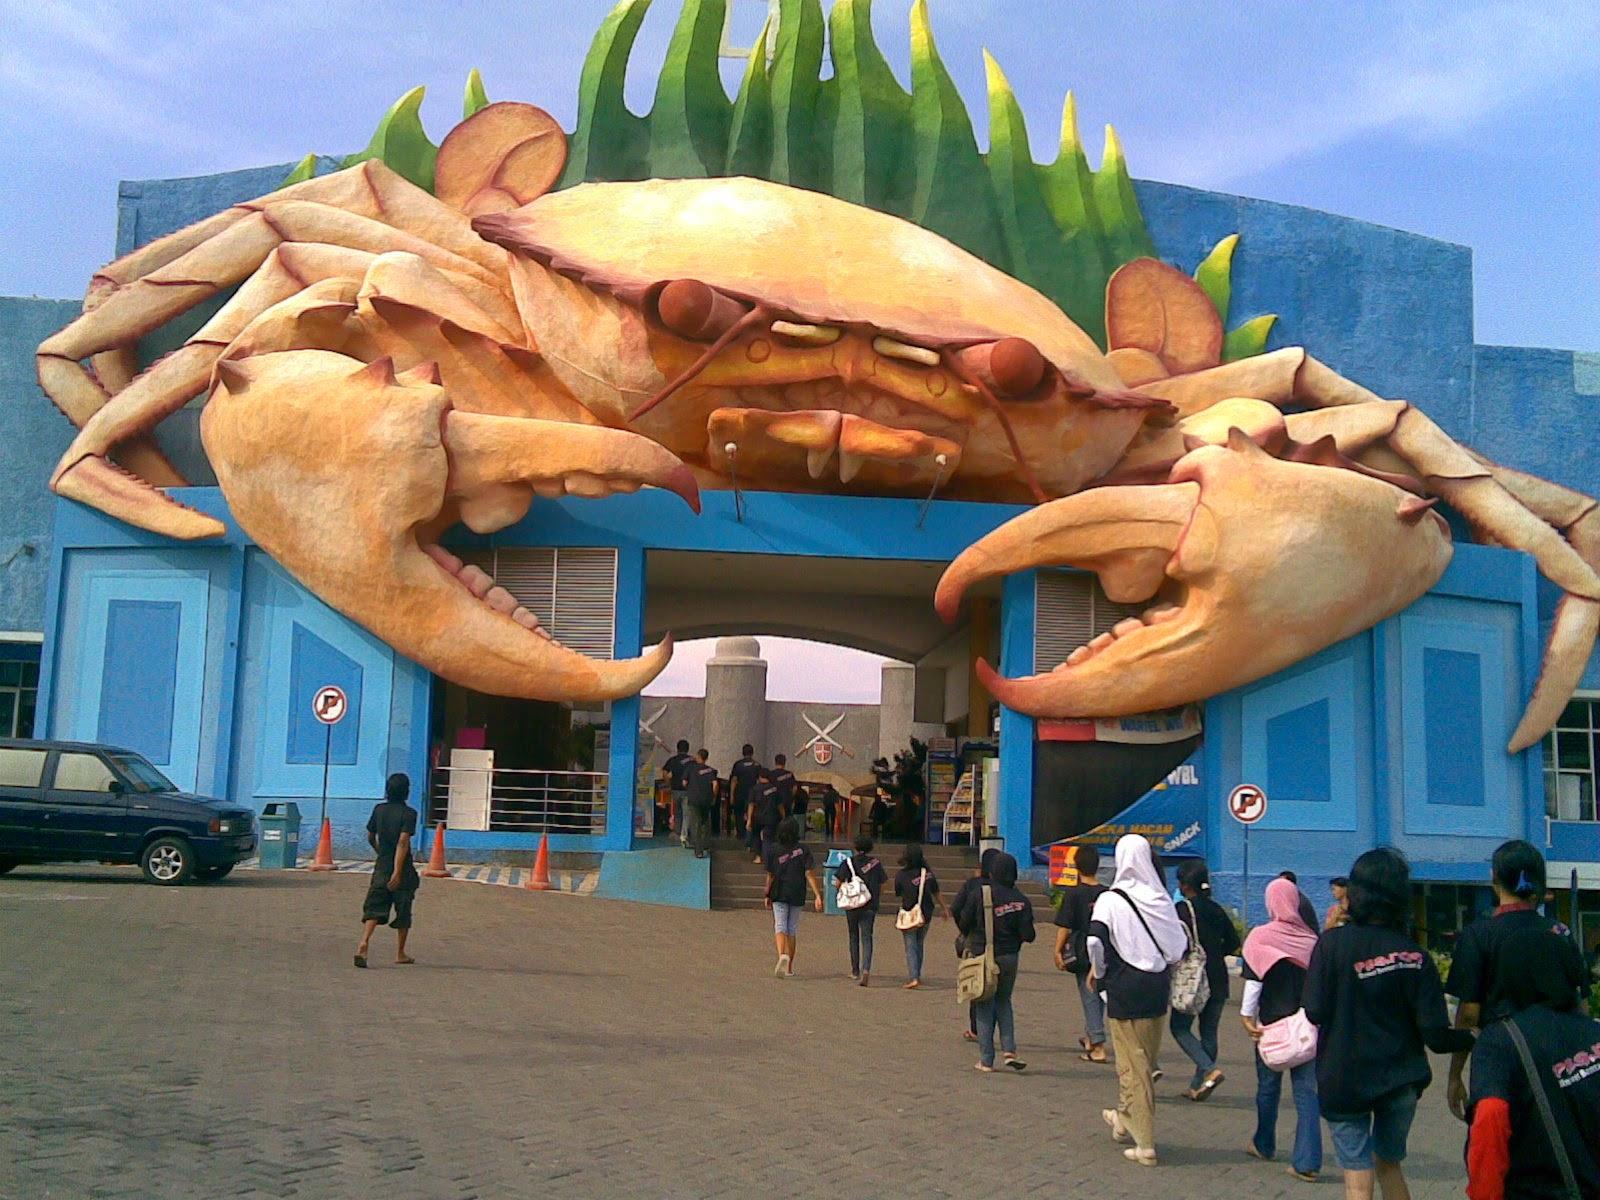 objek wisata jawa timur yang bajib dikunjungi